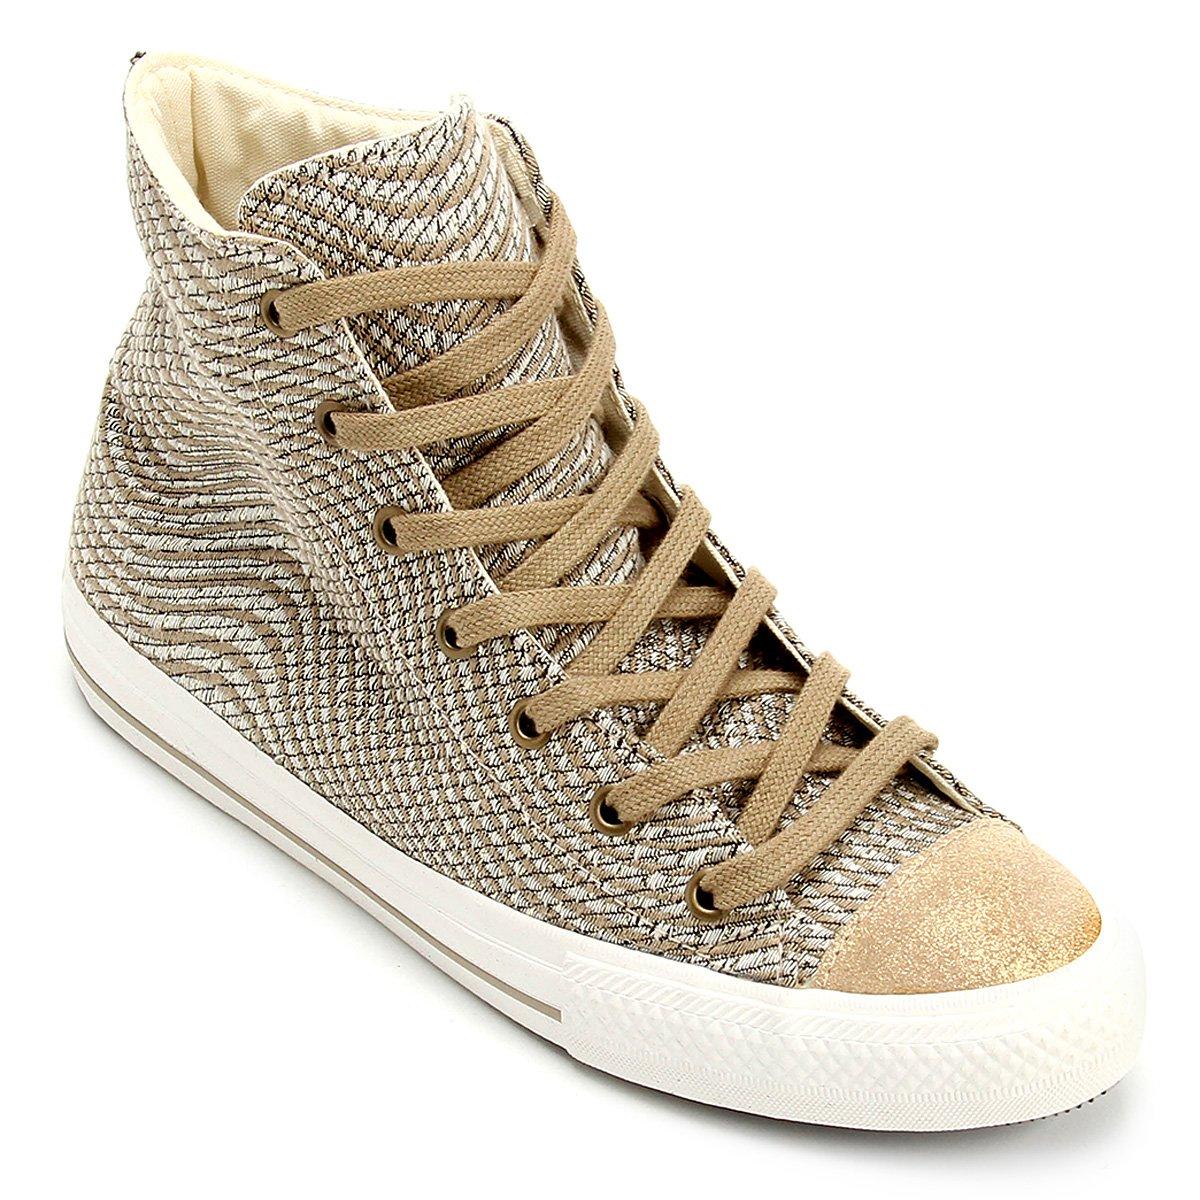 Tênis Converse Chuck Taylor All Star Gemma Hi Feminino - Compre ...  246e43ce1d92cf  Netshoes. e4d8a337142fc